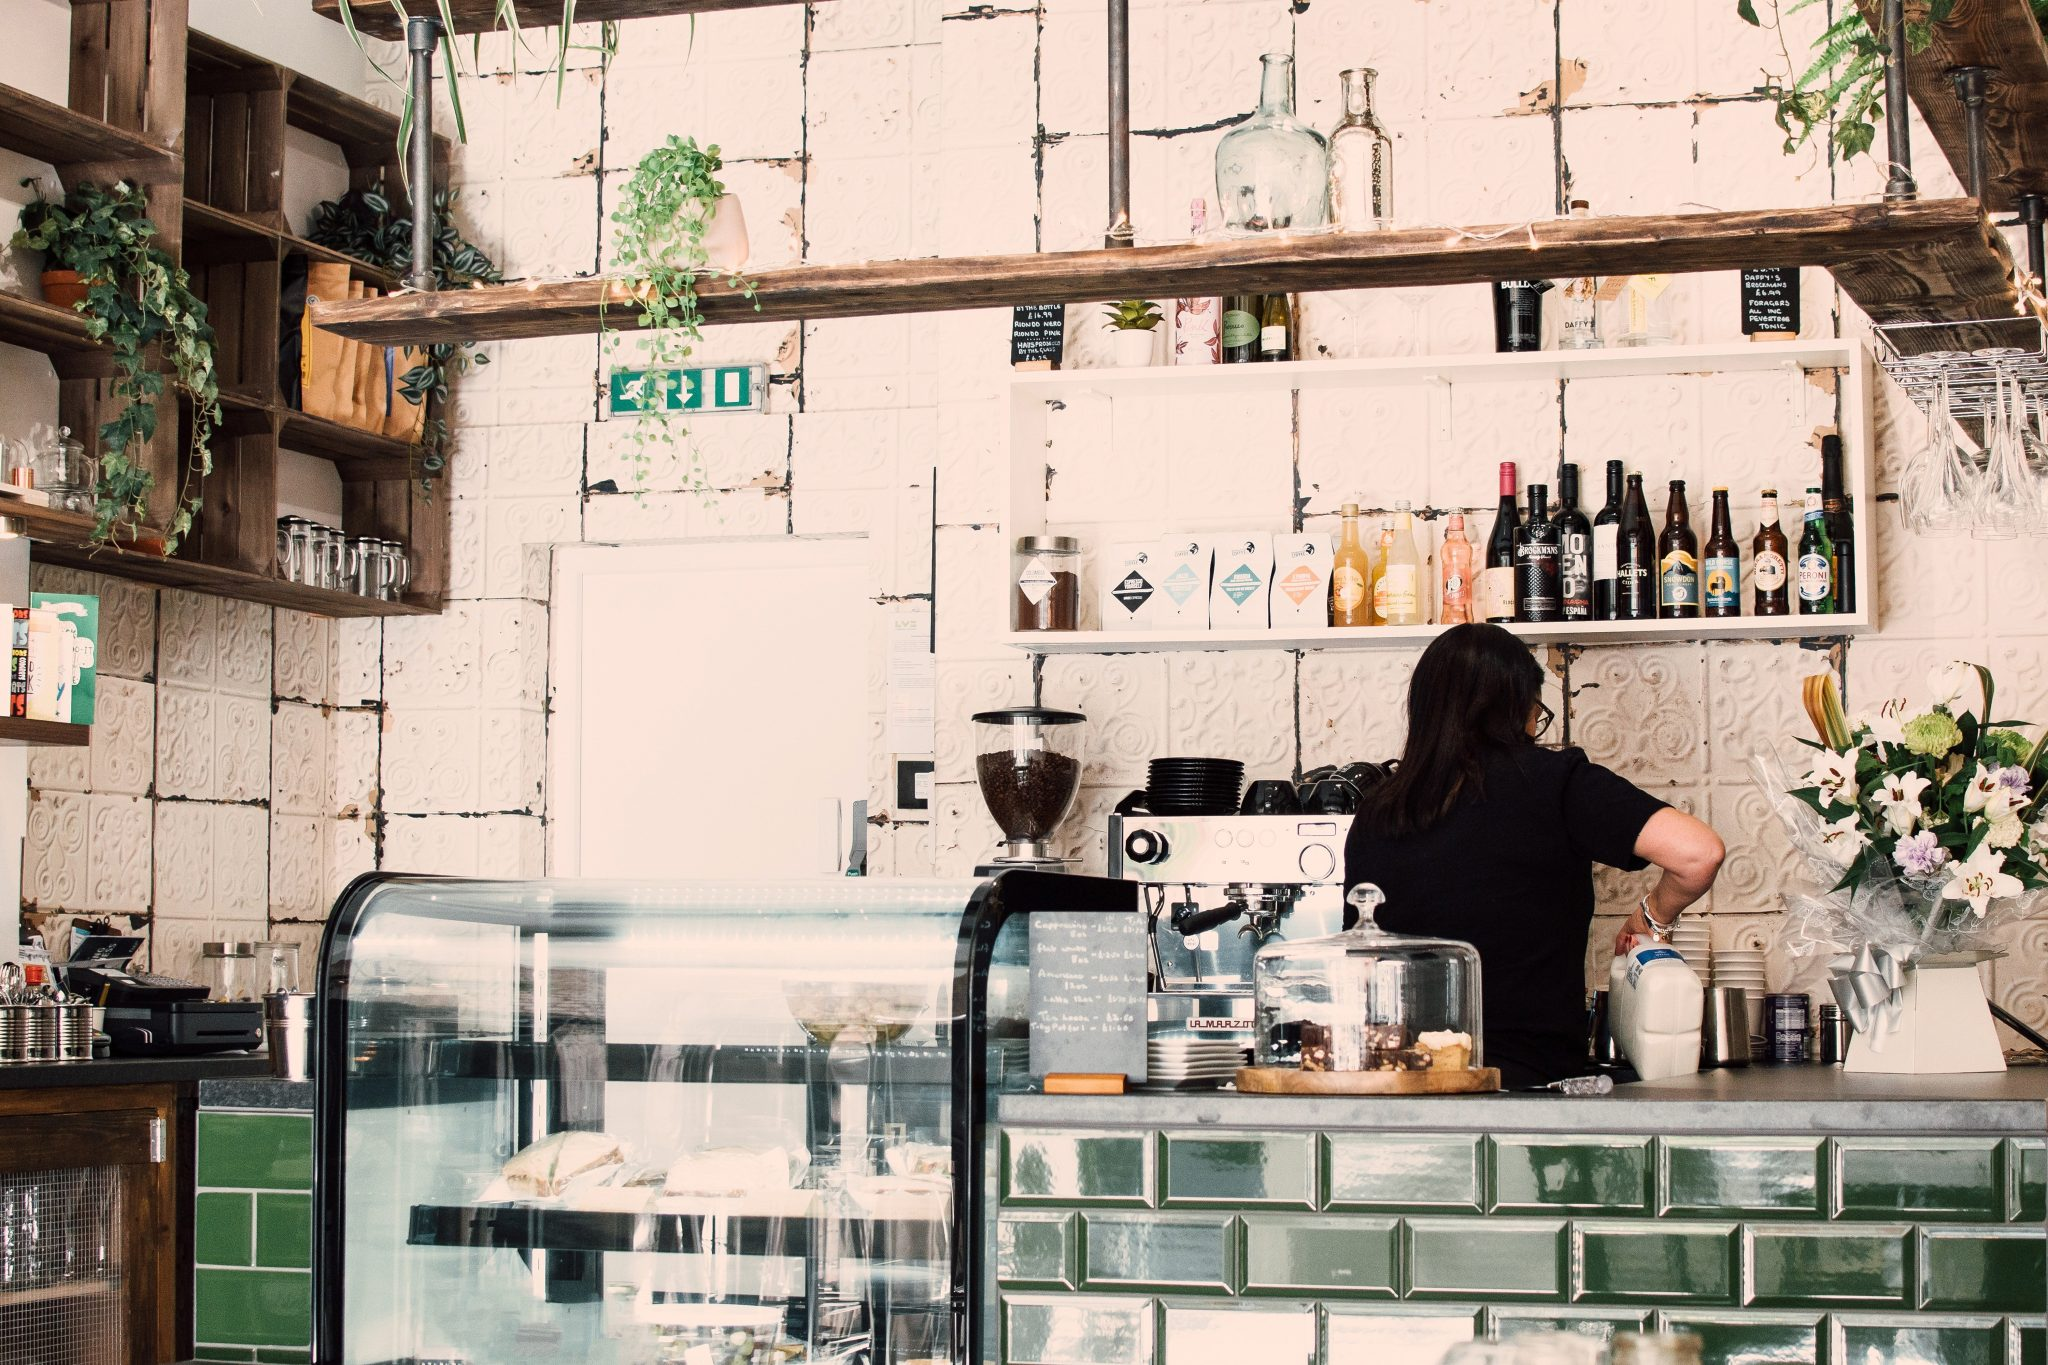 adult-bar-bar-cafe-1137745